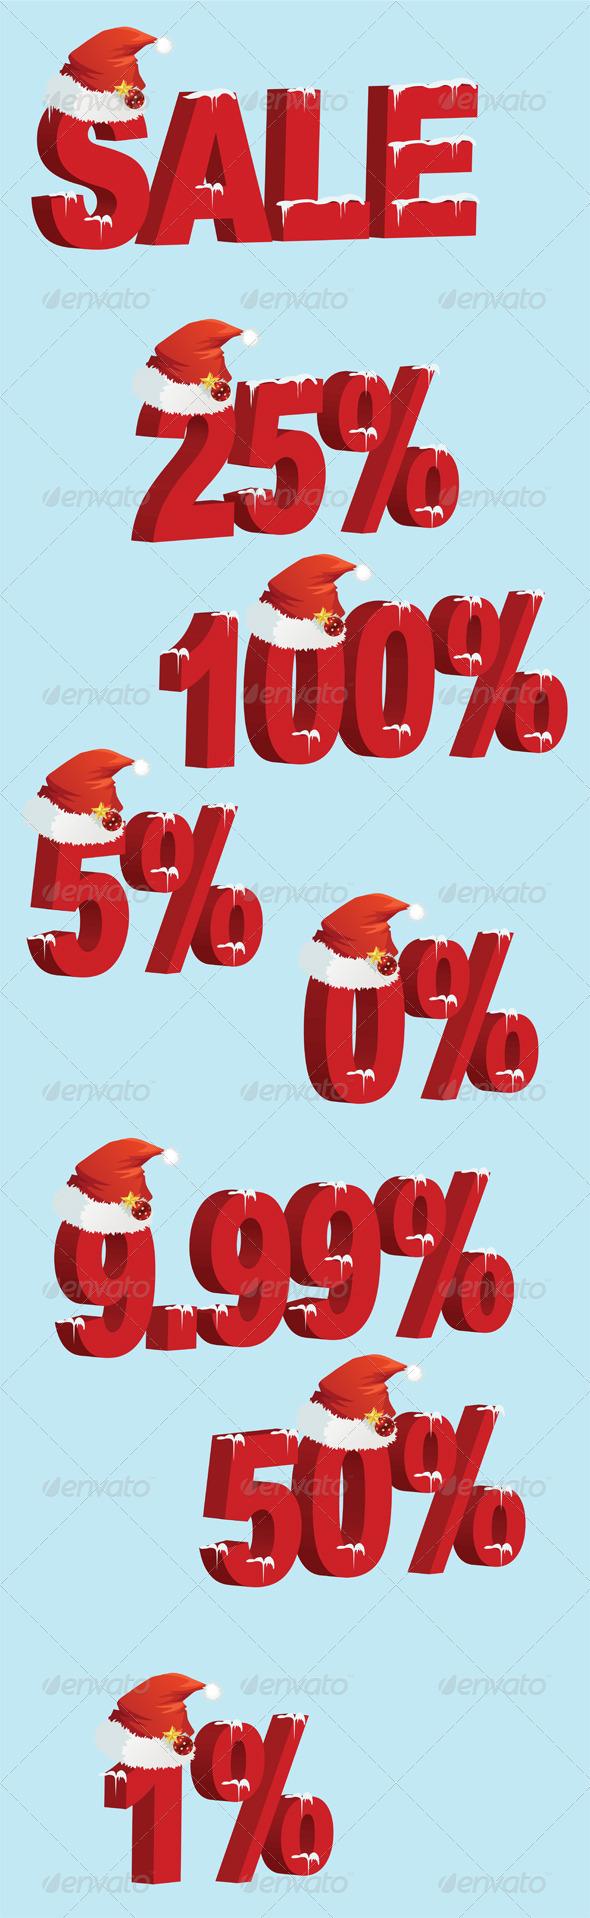 GraphicRiver Christmas Price Tag 3280391